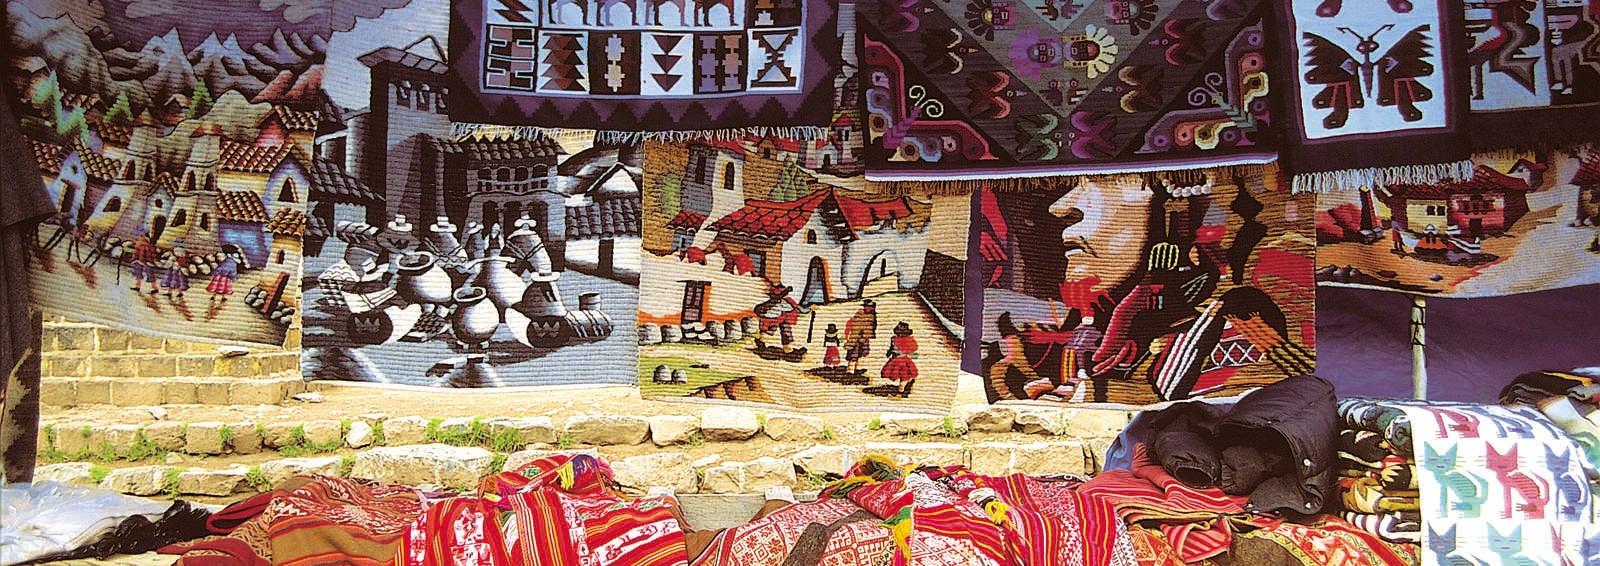 Weavings and paintings for sale, Chiapas